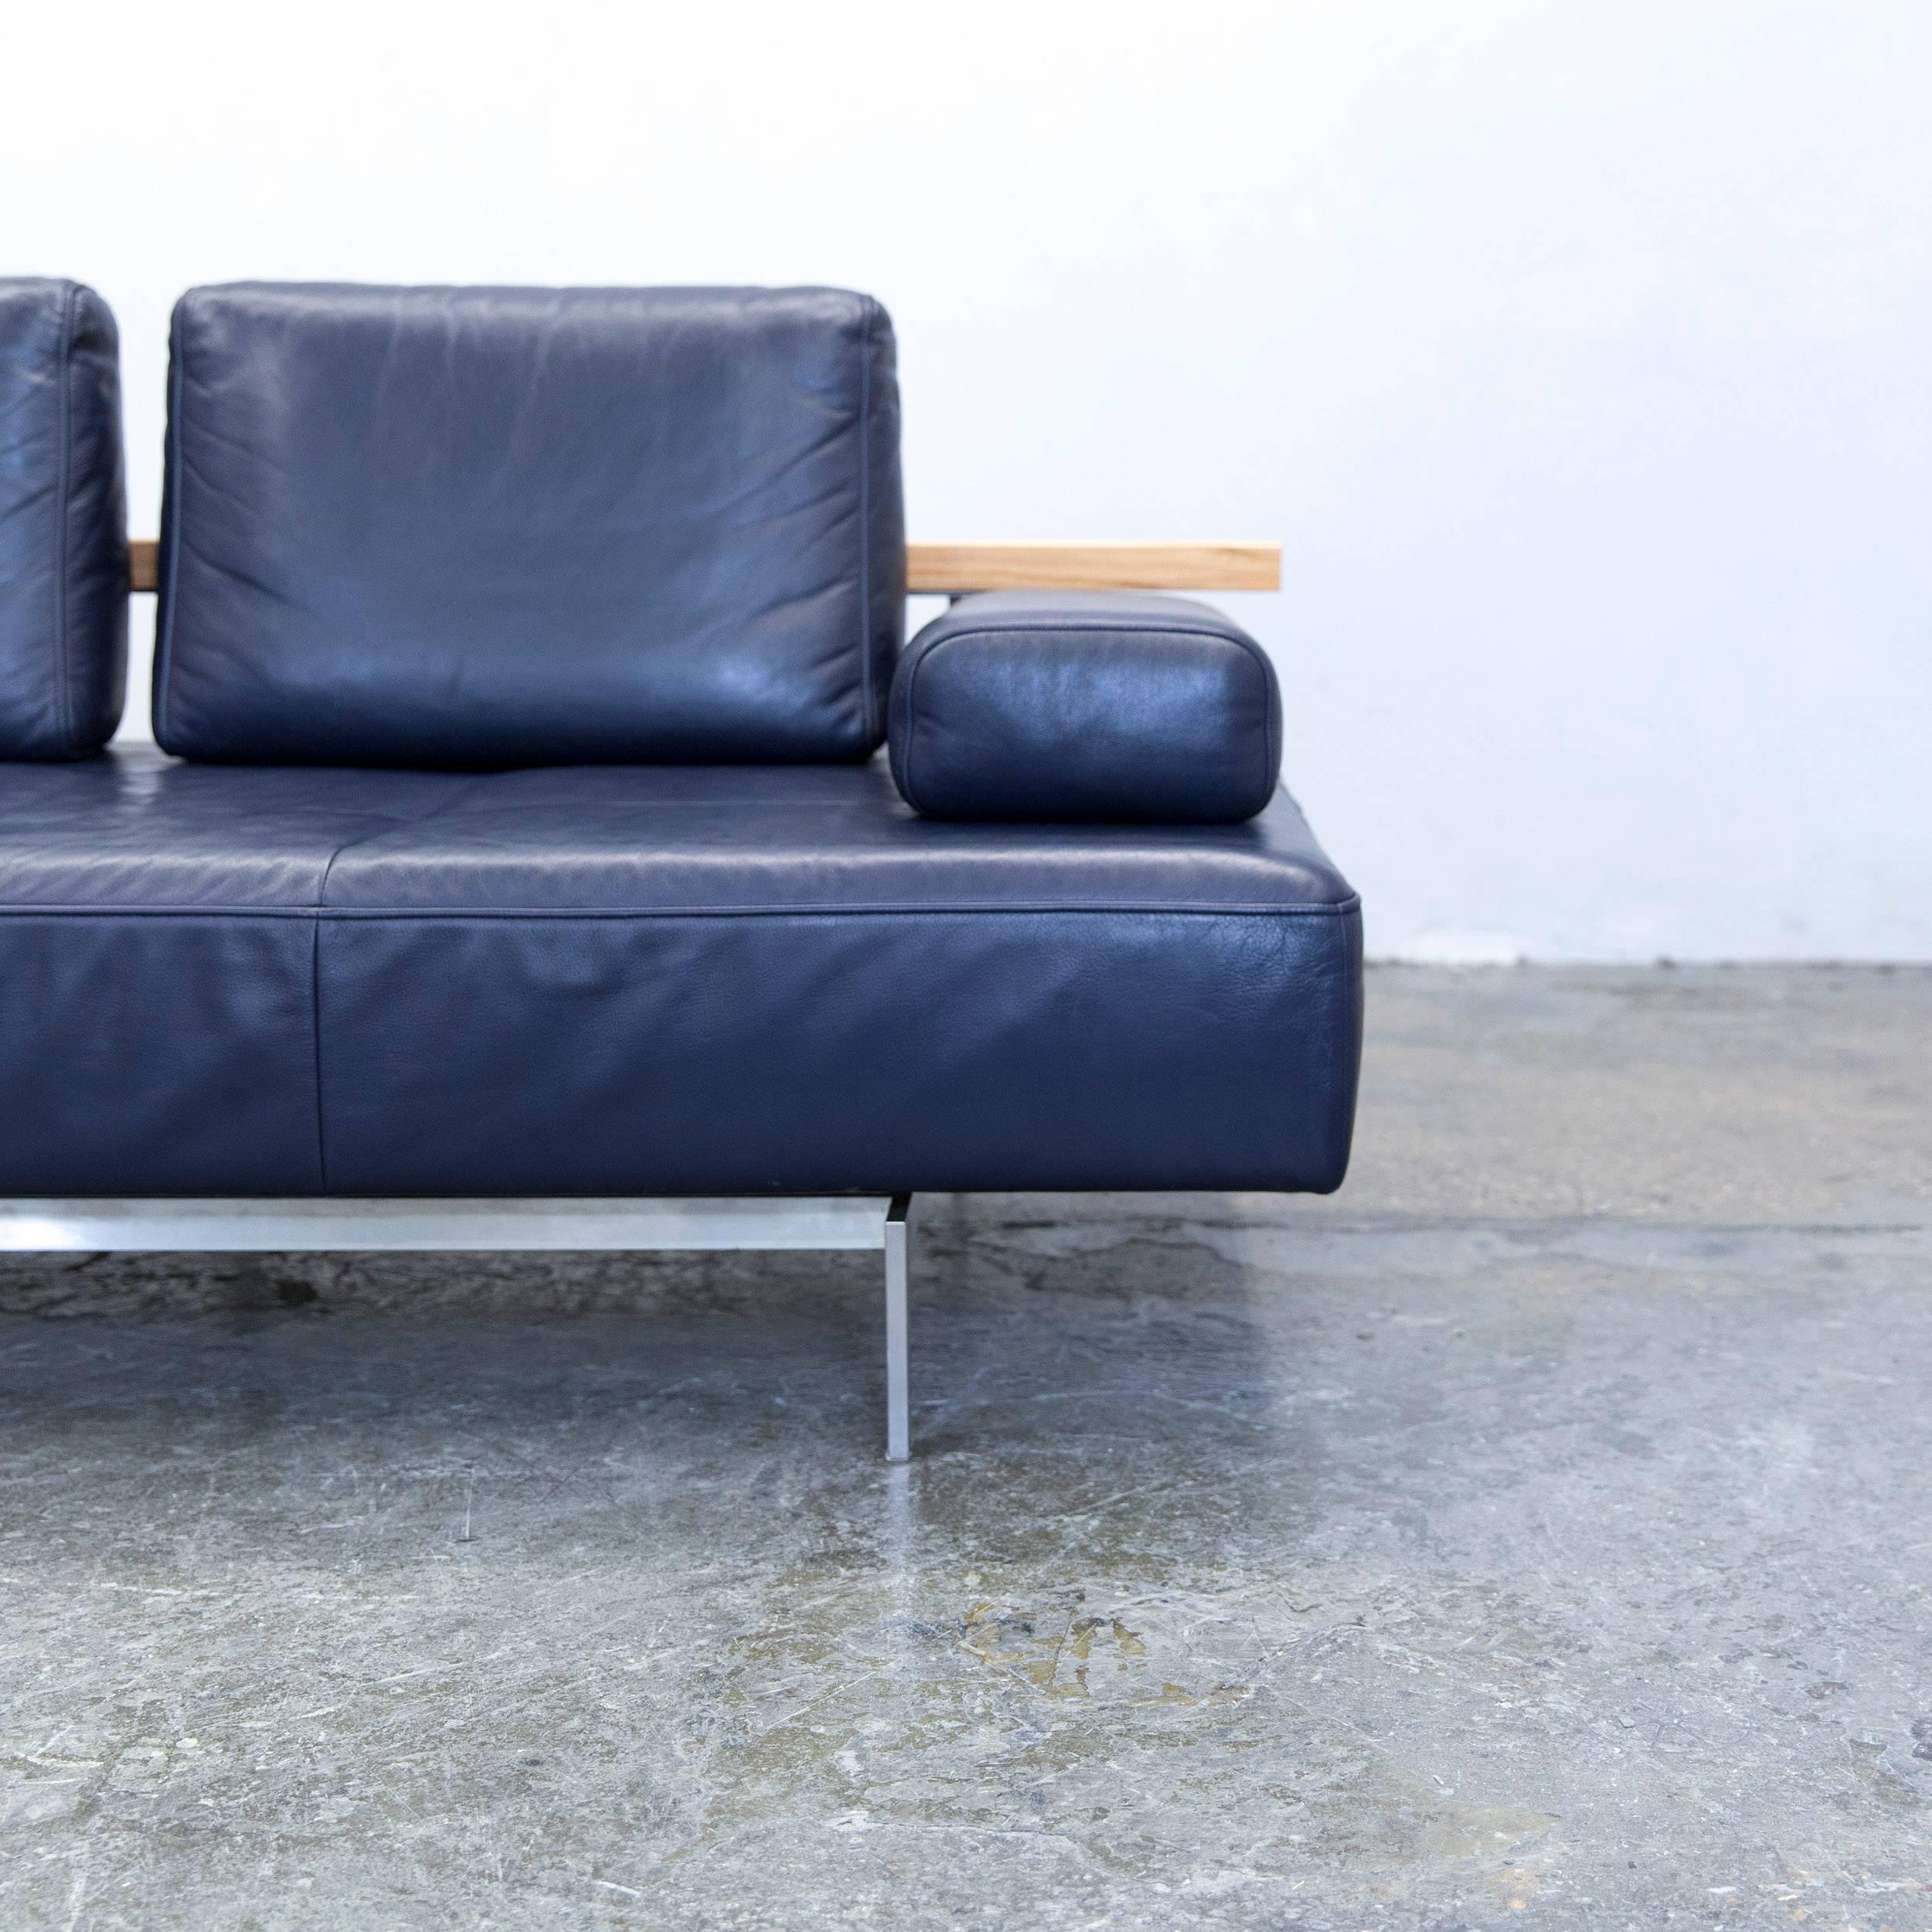 rolf benz schlafsofa fabulous sofas architektur und. Black Bedroom Furniture Sets. Home Design Ideas